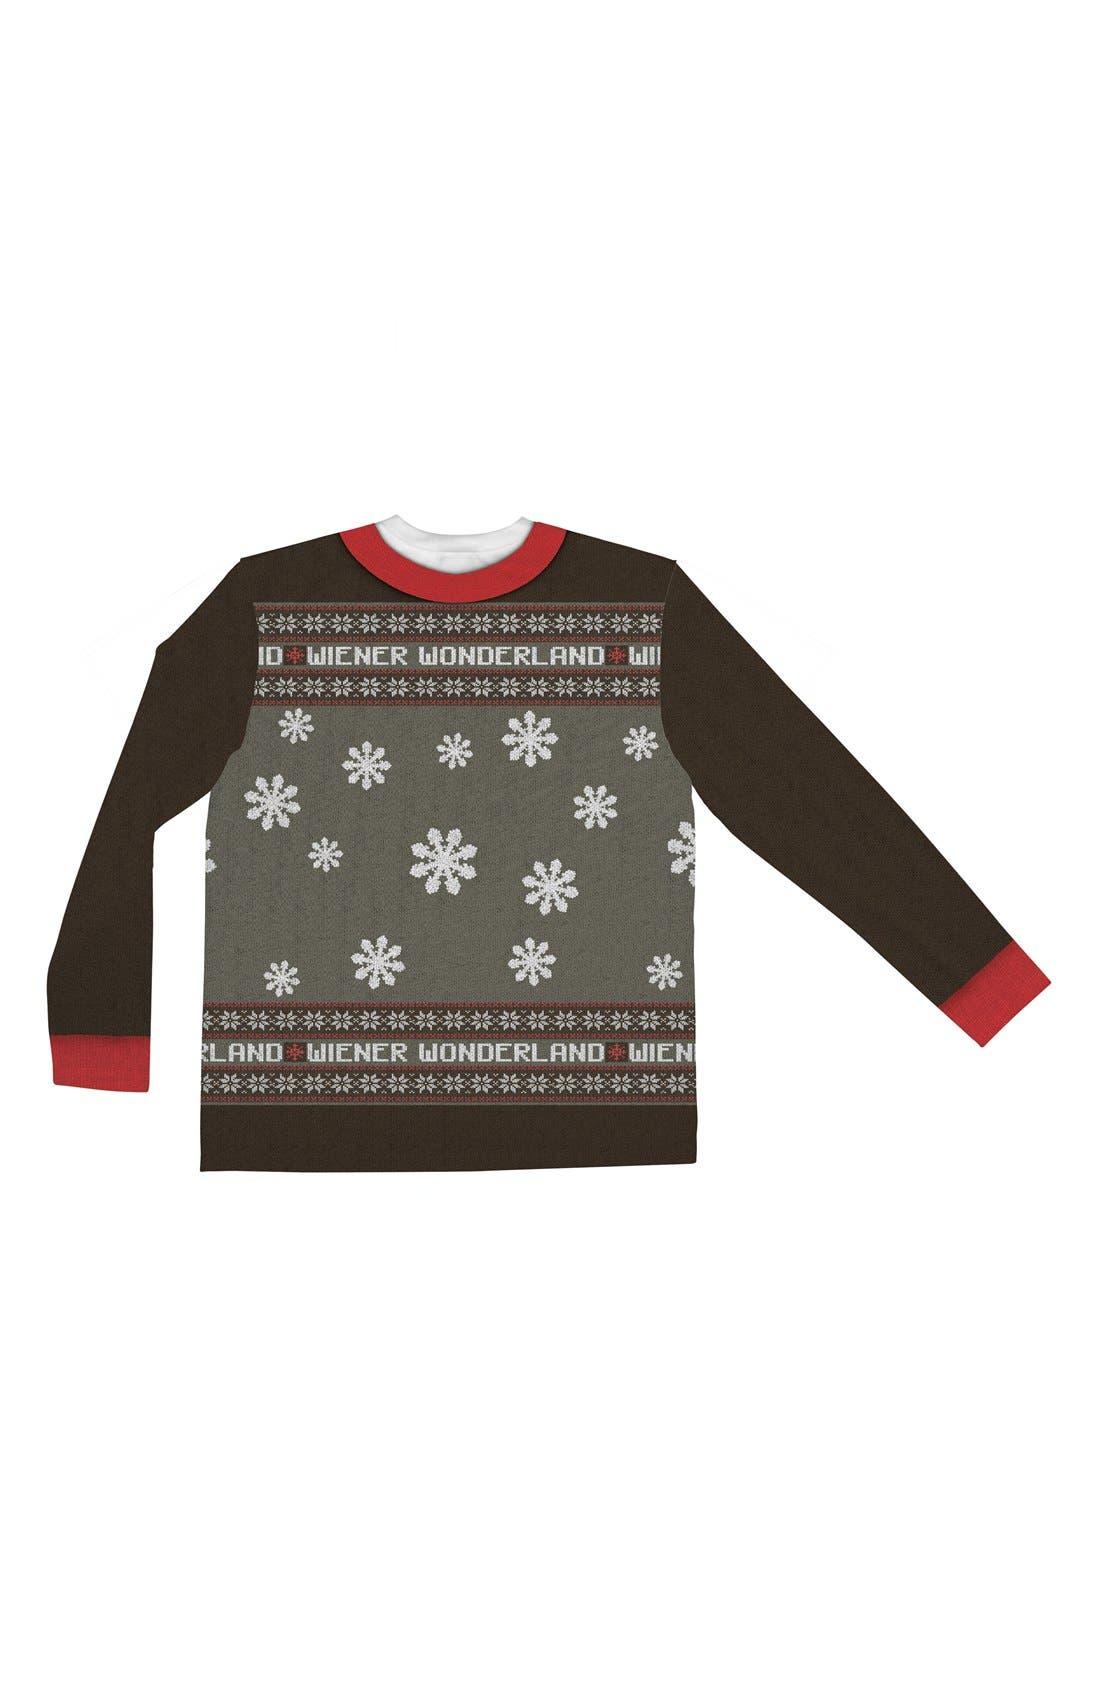 FAUX REAL,                             'Wiener Wonderland' Ugly Christmas Long Sleeve Novelty T-Shirt,                             Alternate thumbnail 2, color,                             200